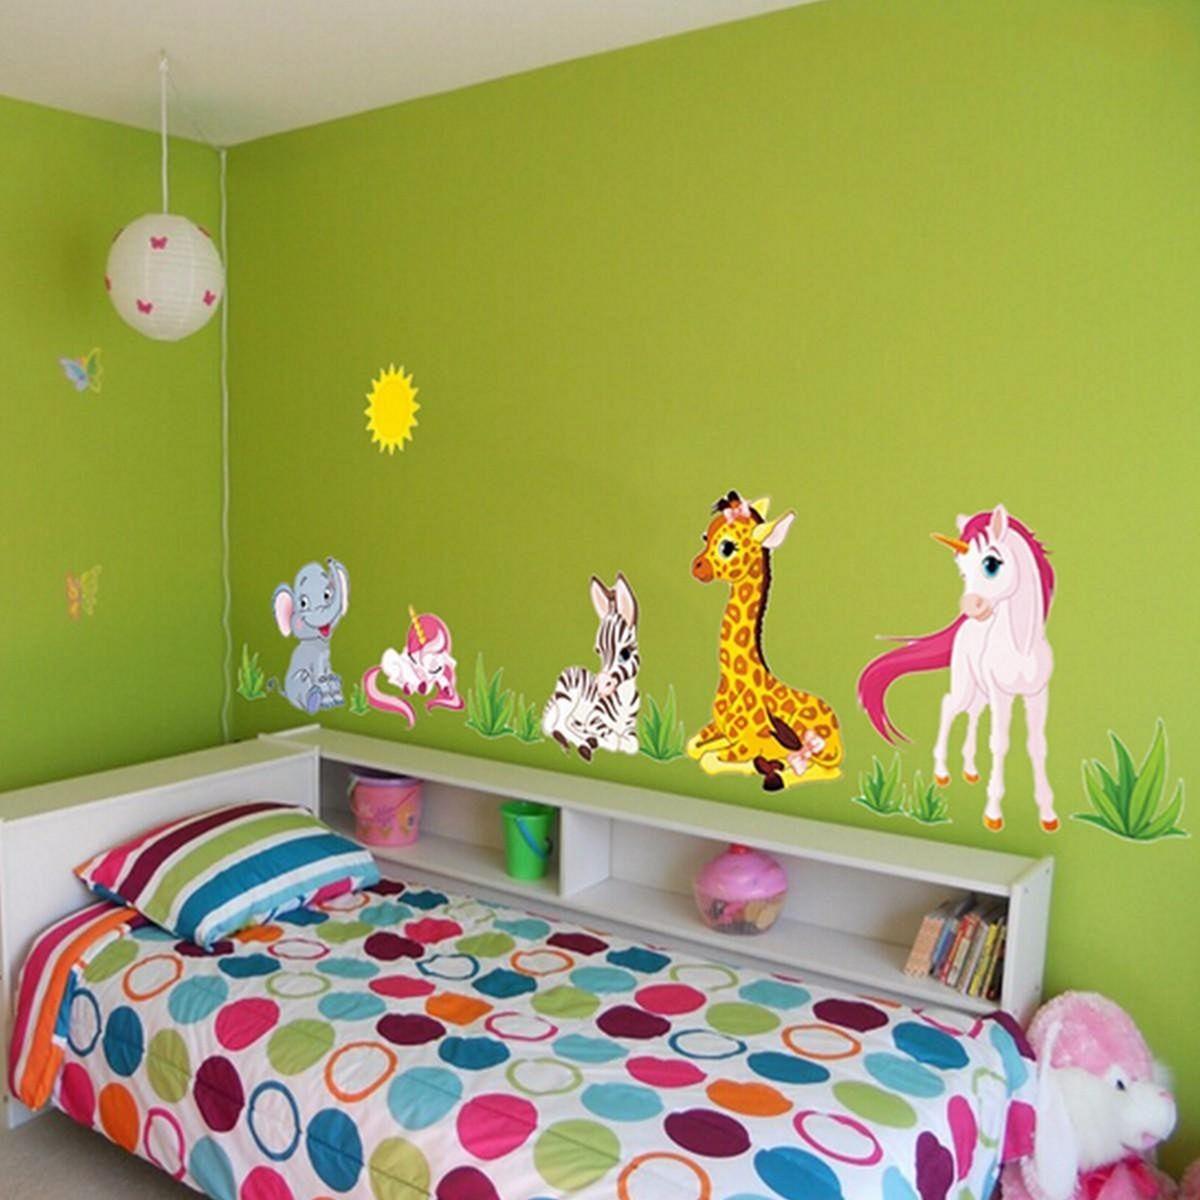 15 Fabulous And Creative Kids Room Wall Decoration Ideas Kids